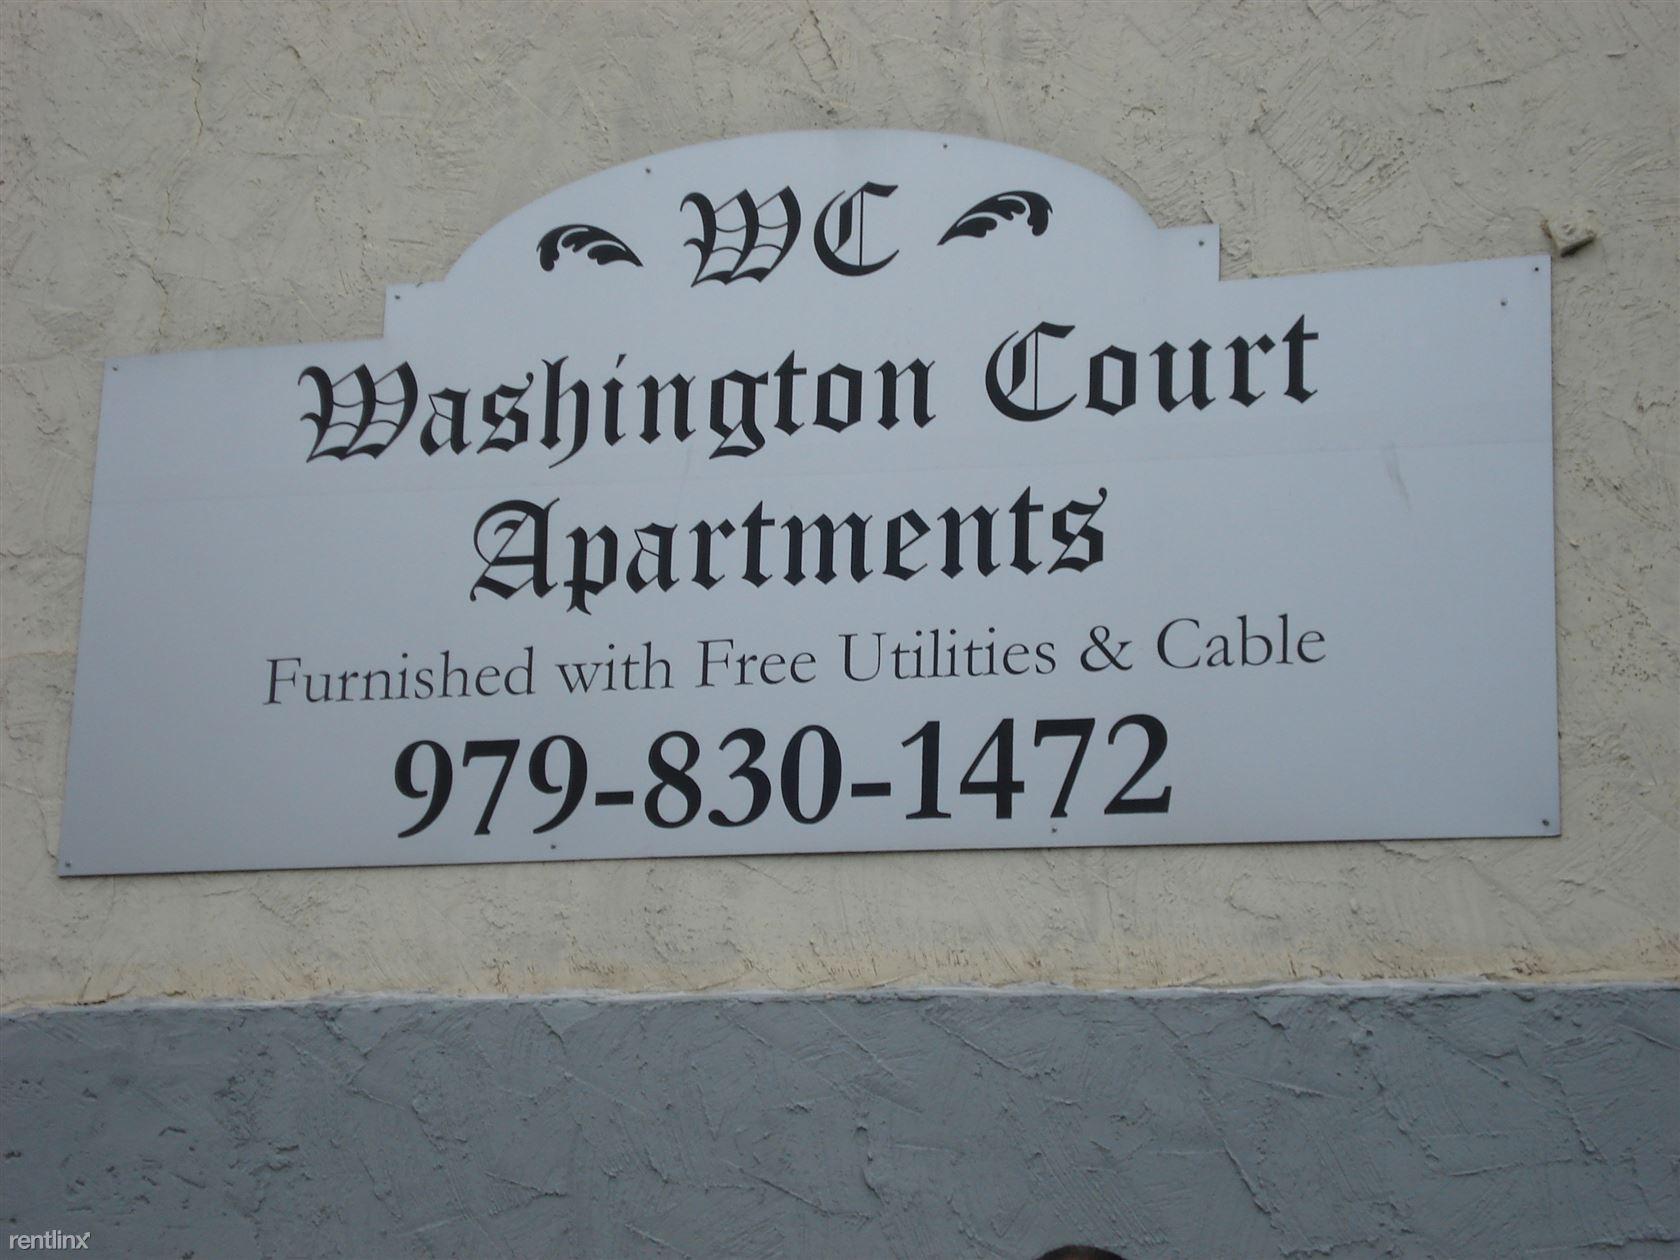 Washington Court Apartments